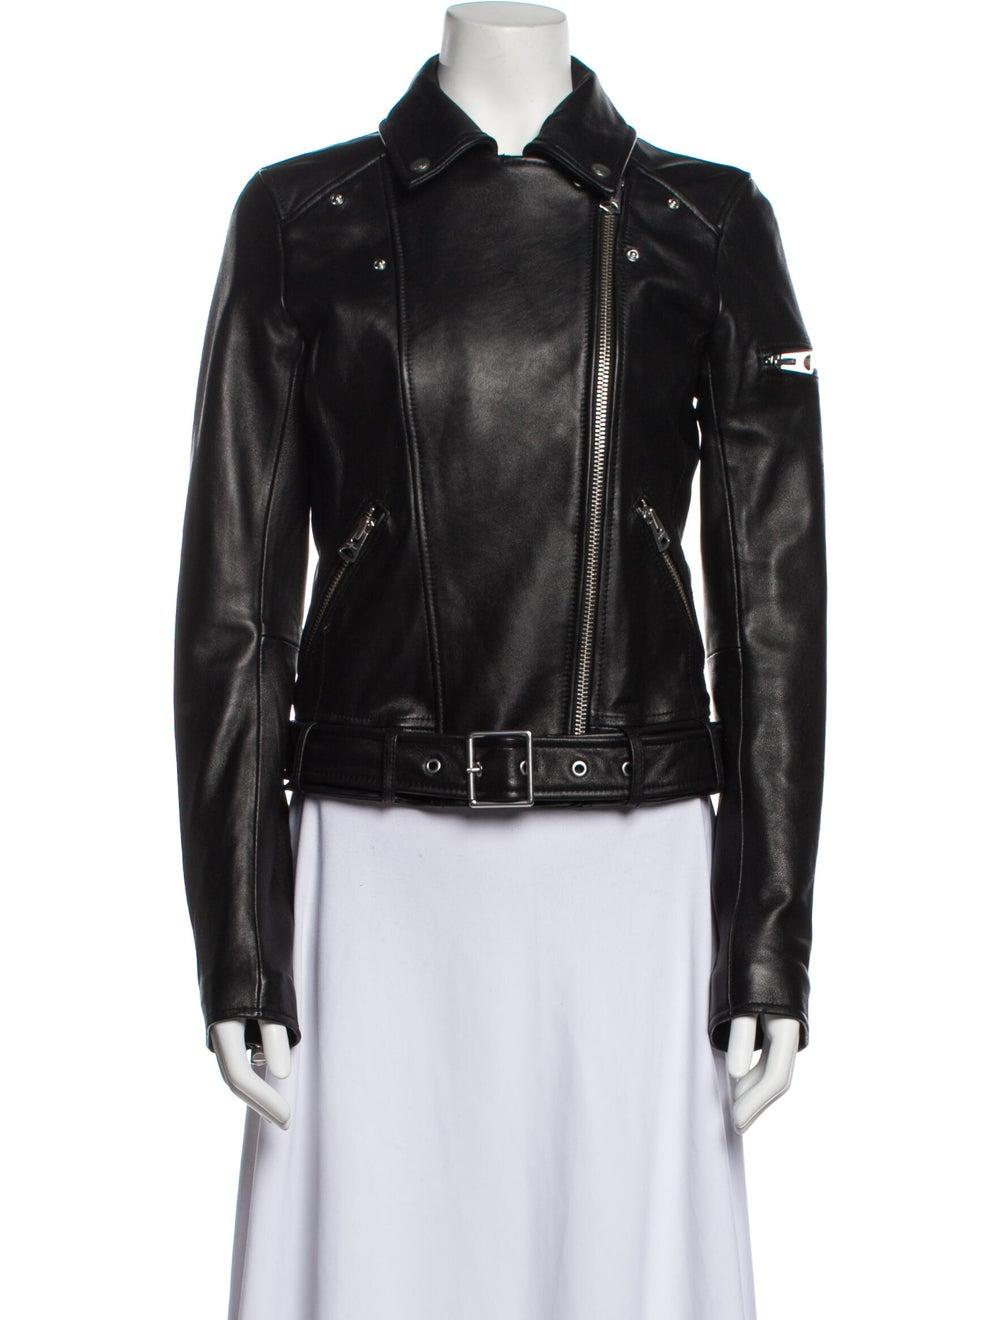 Jacket Leather Biker Jacket Black - image 4